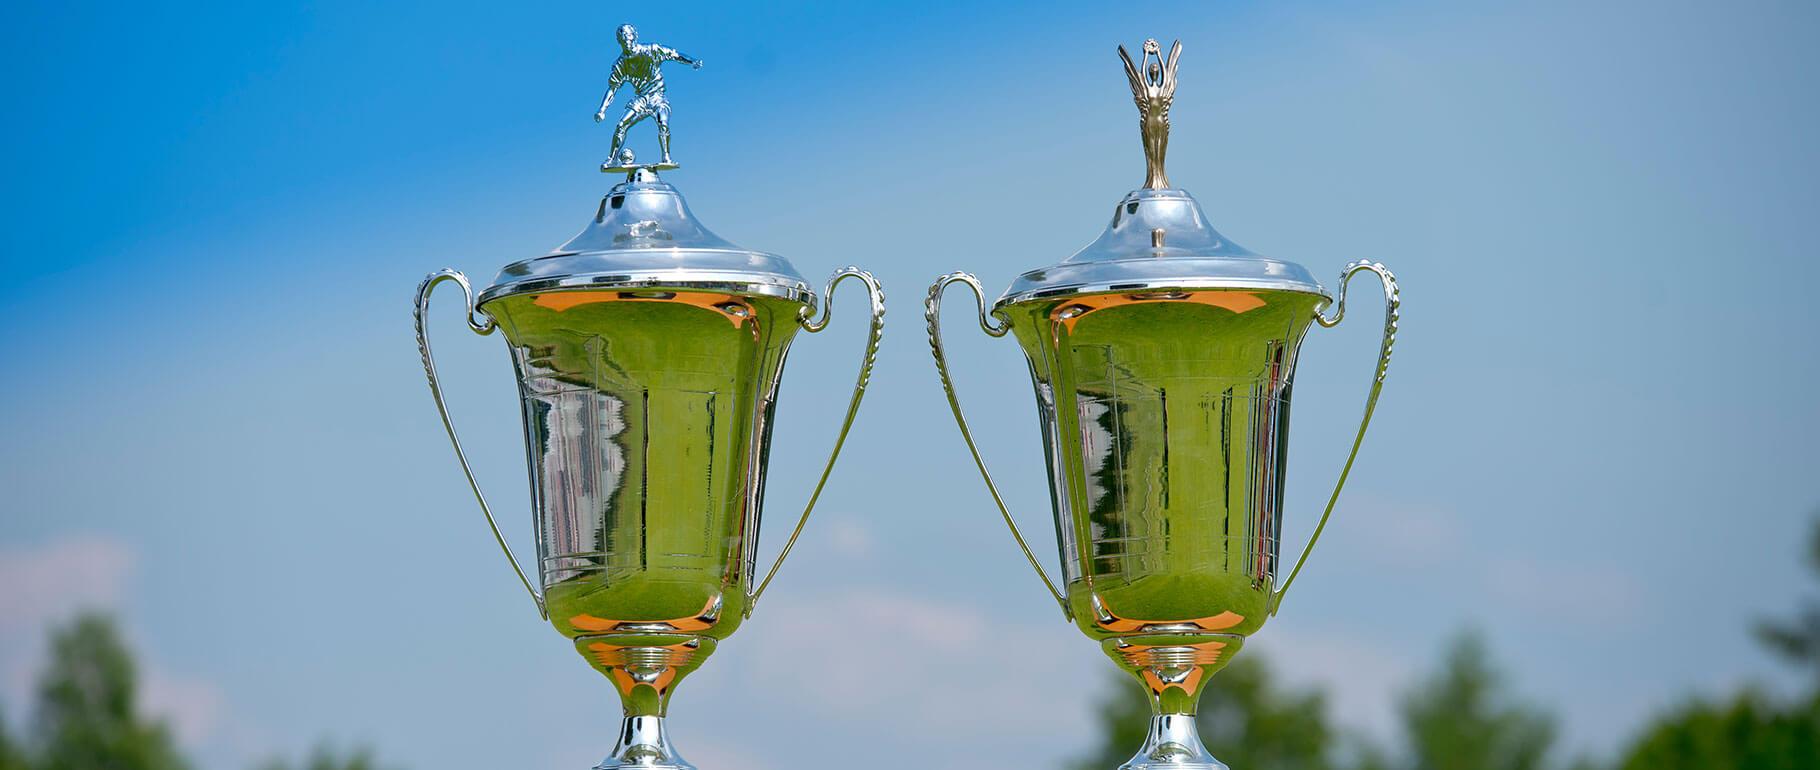 ERDINGER Meister-Cup